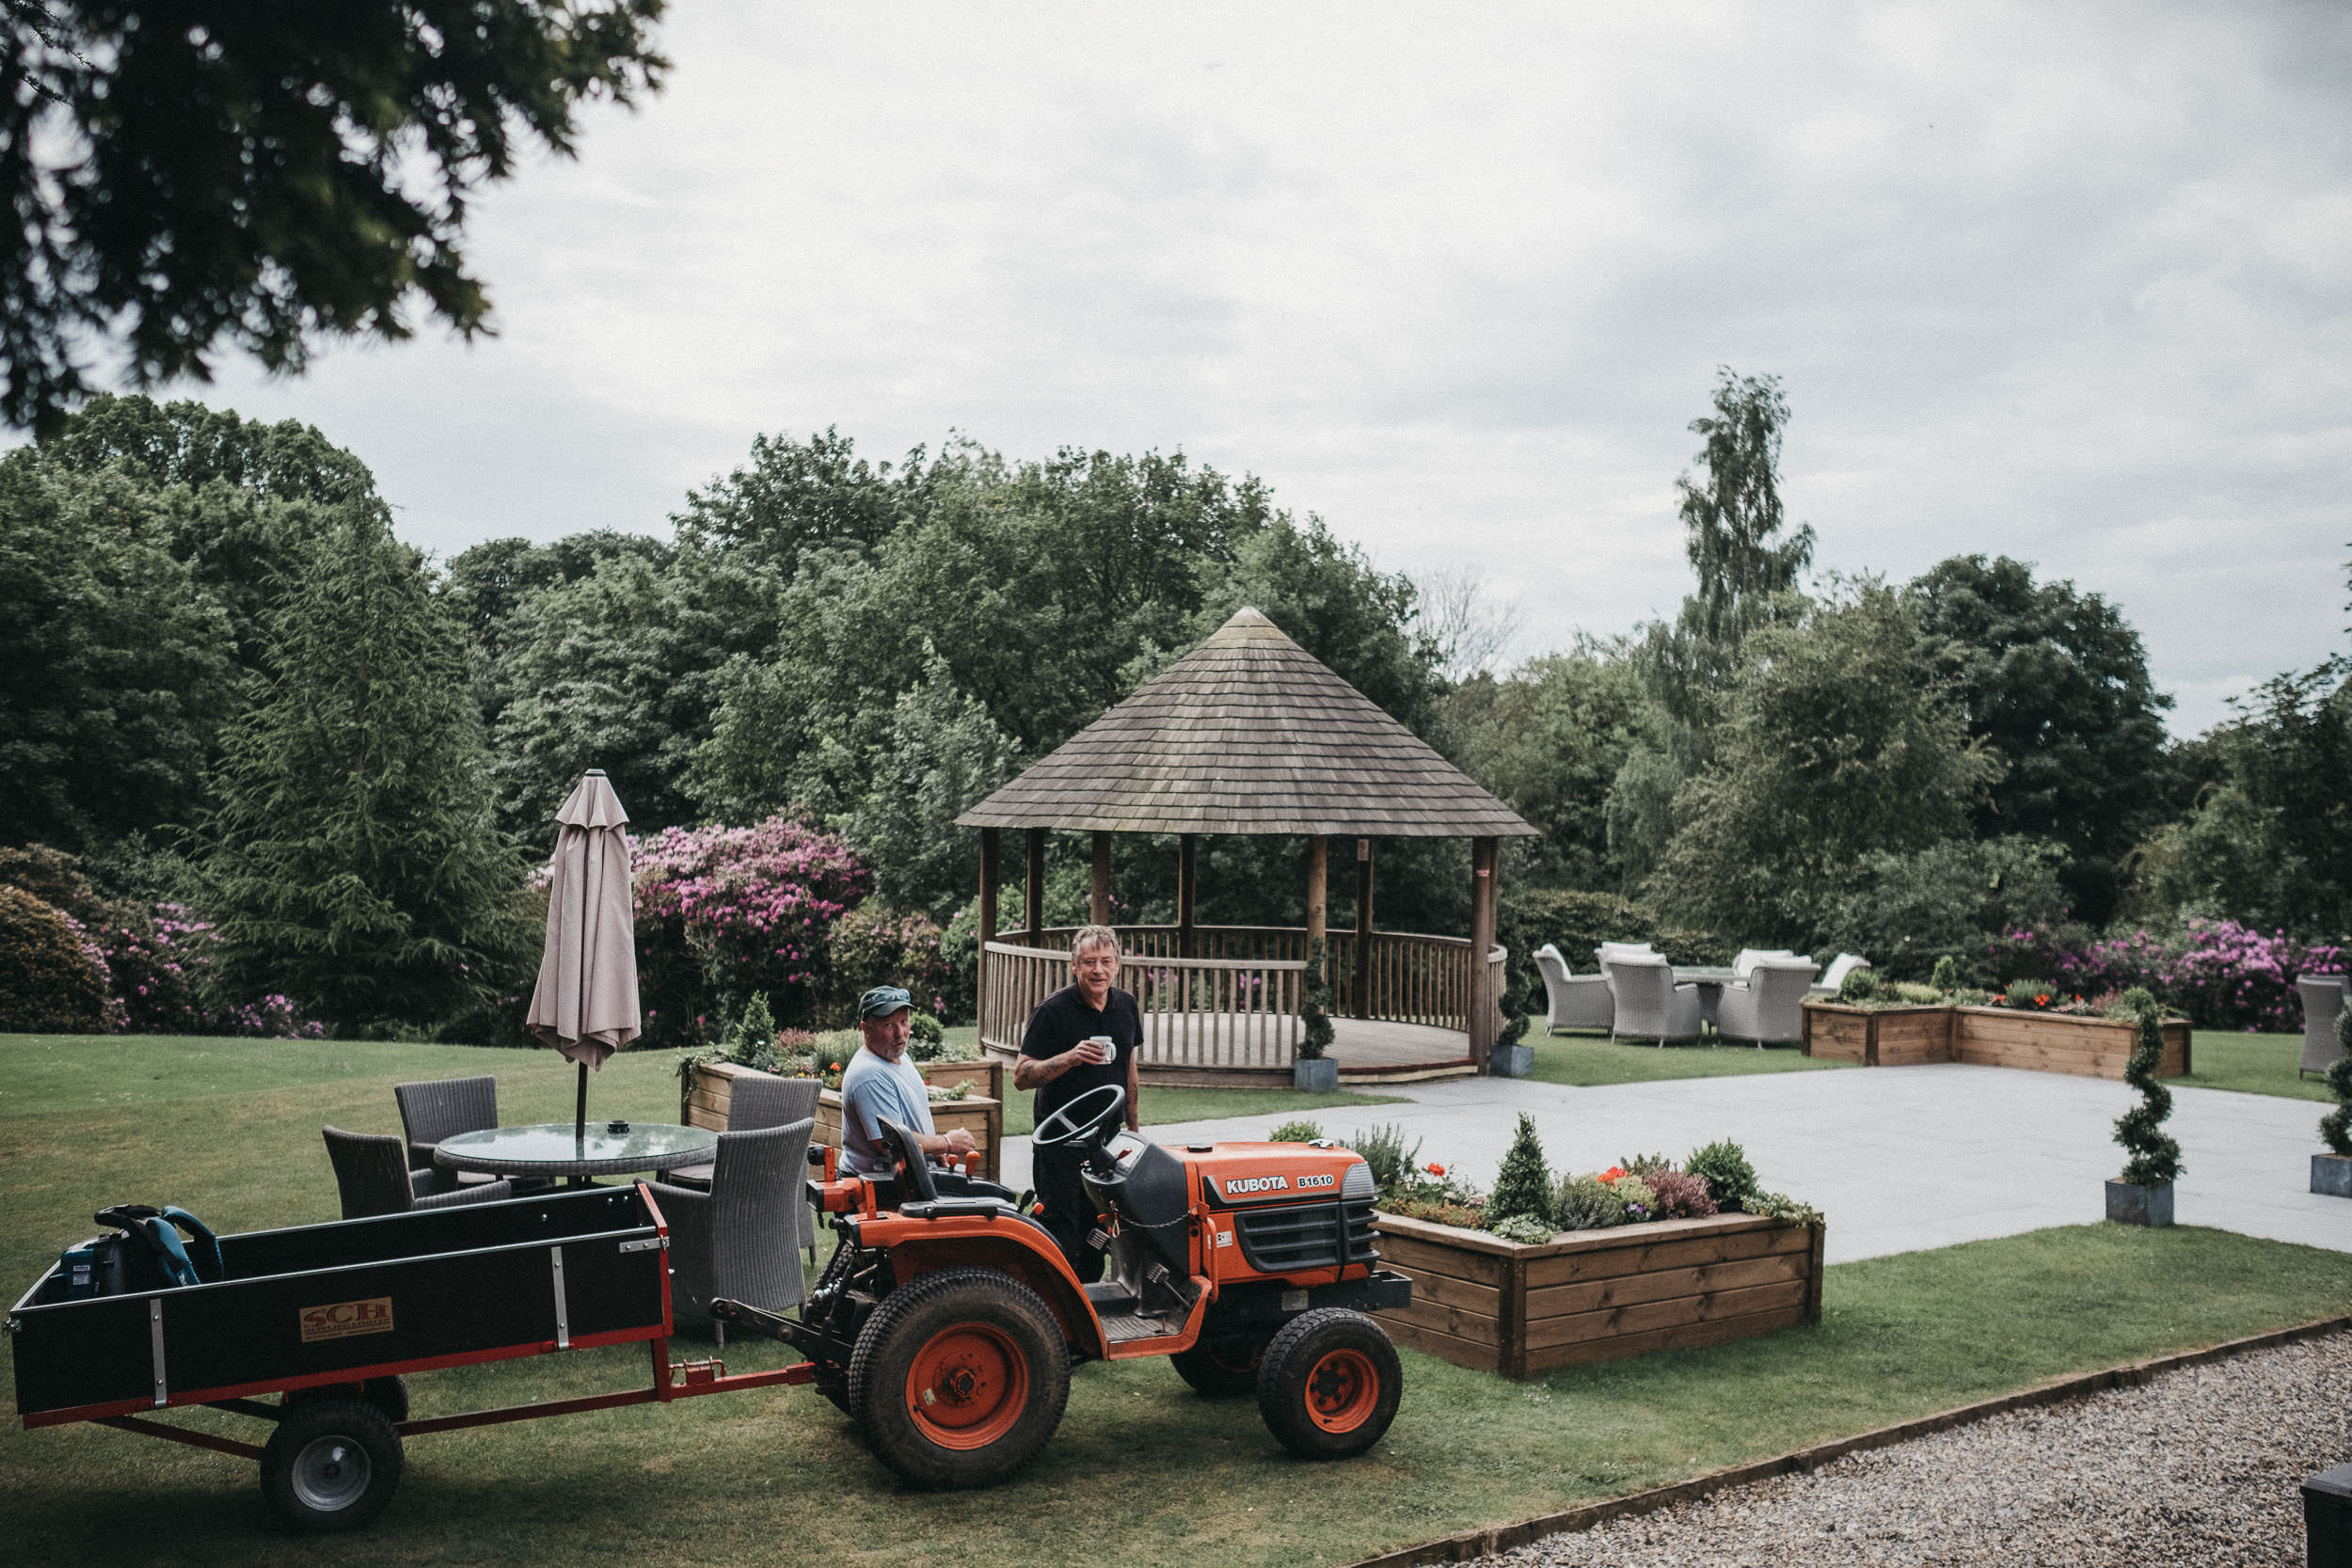 Workman having a tea break near tractor while getting gazebo ready